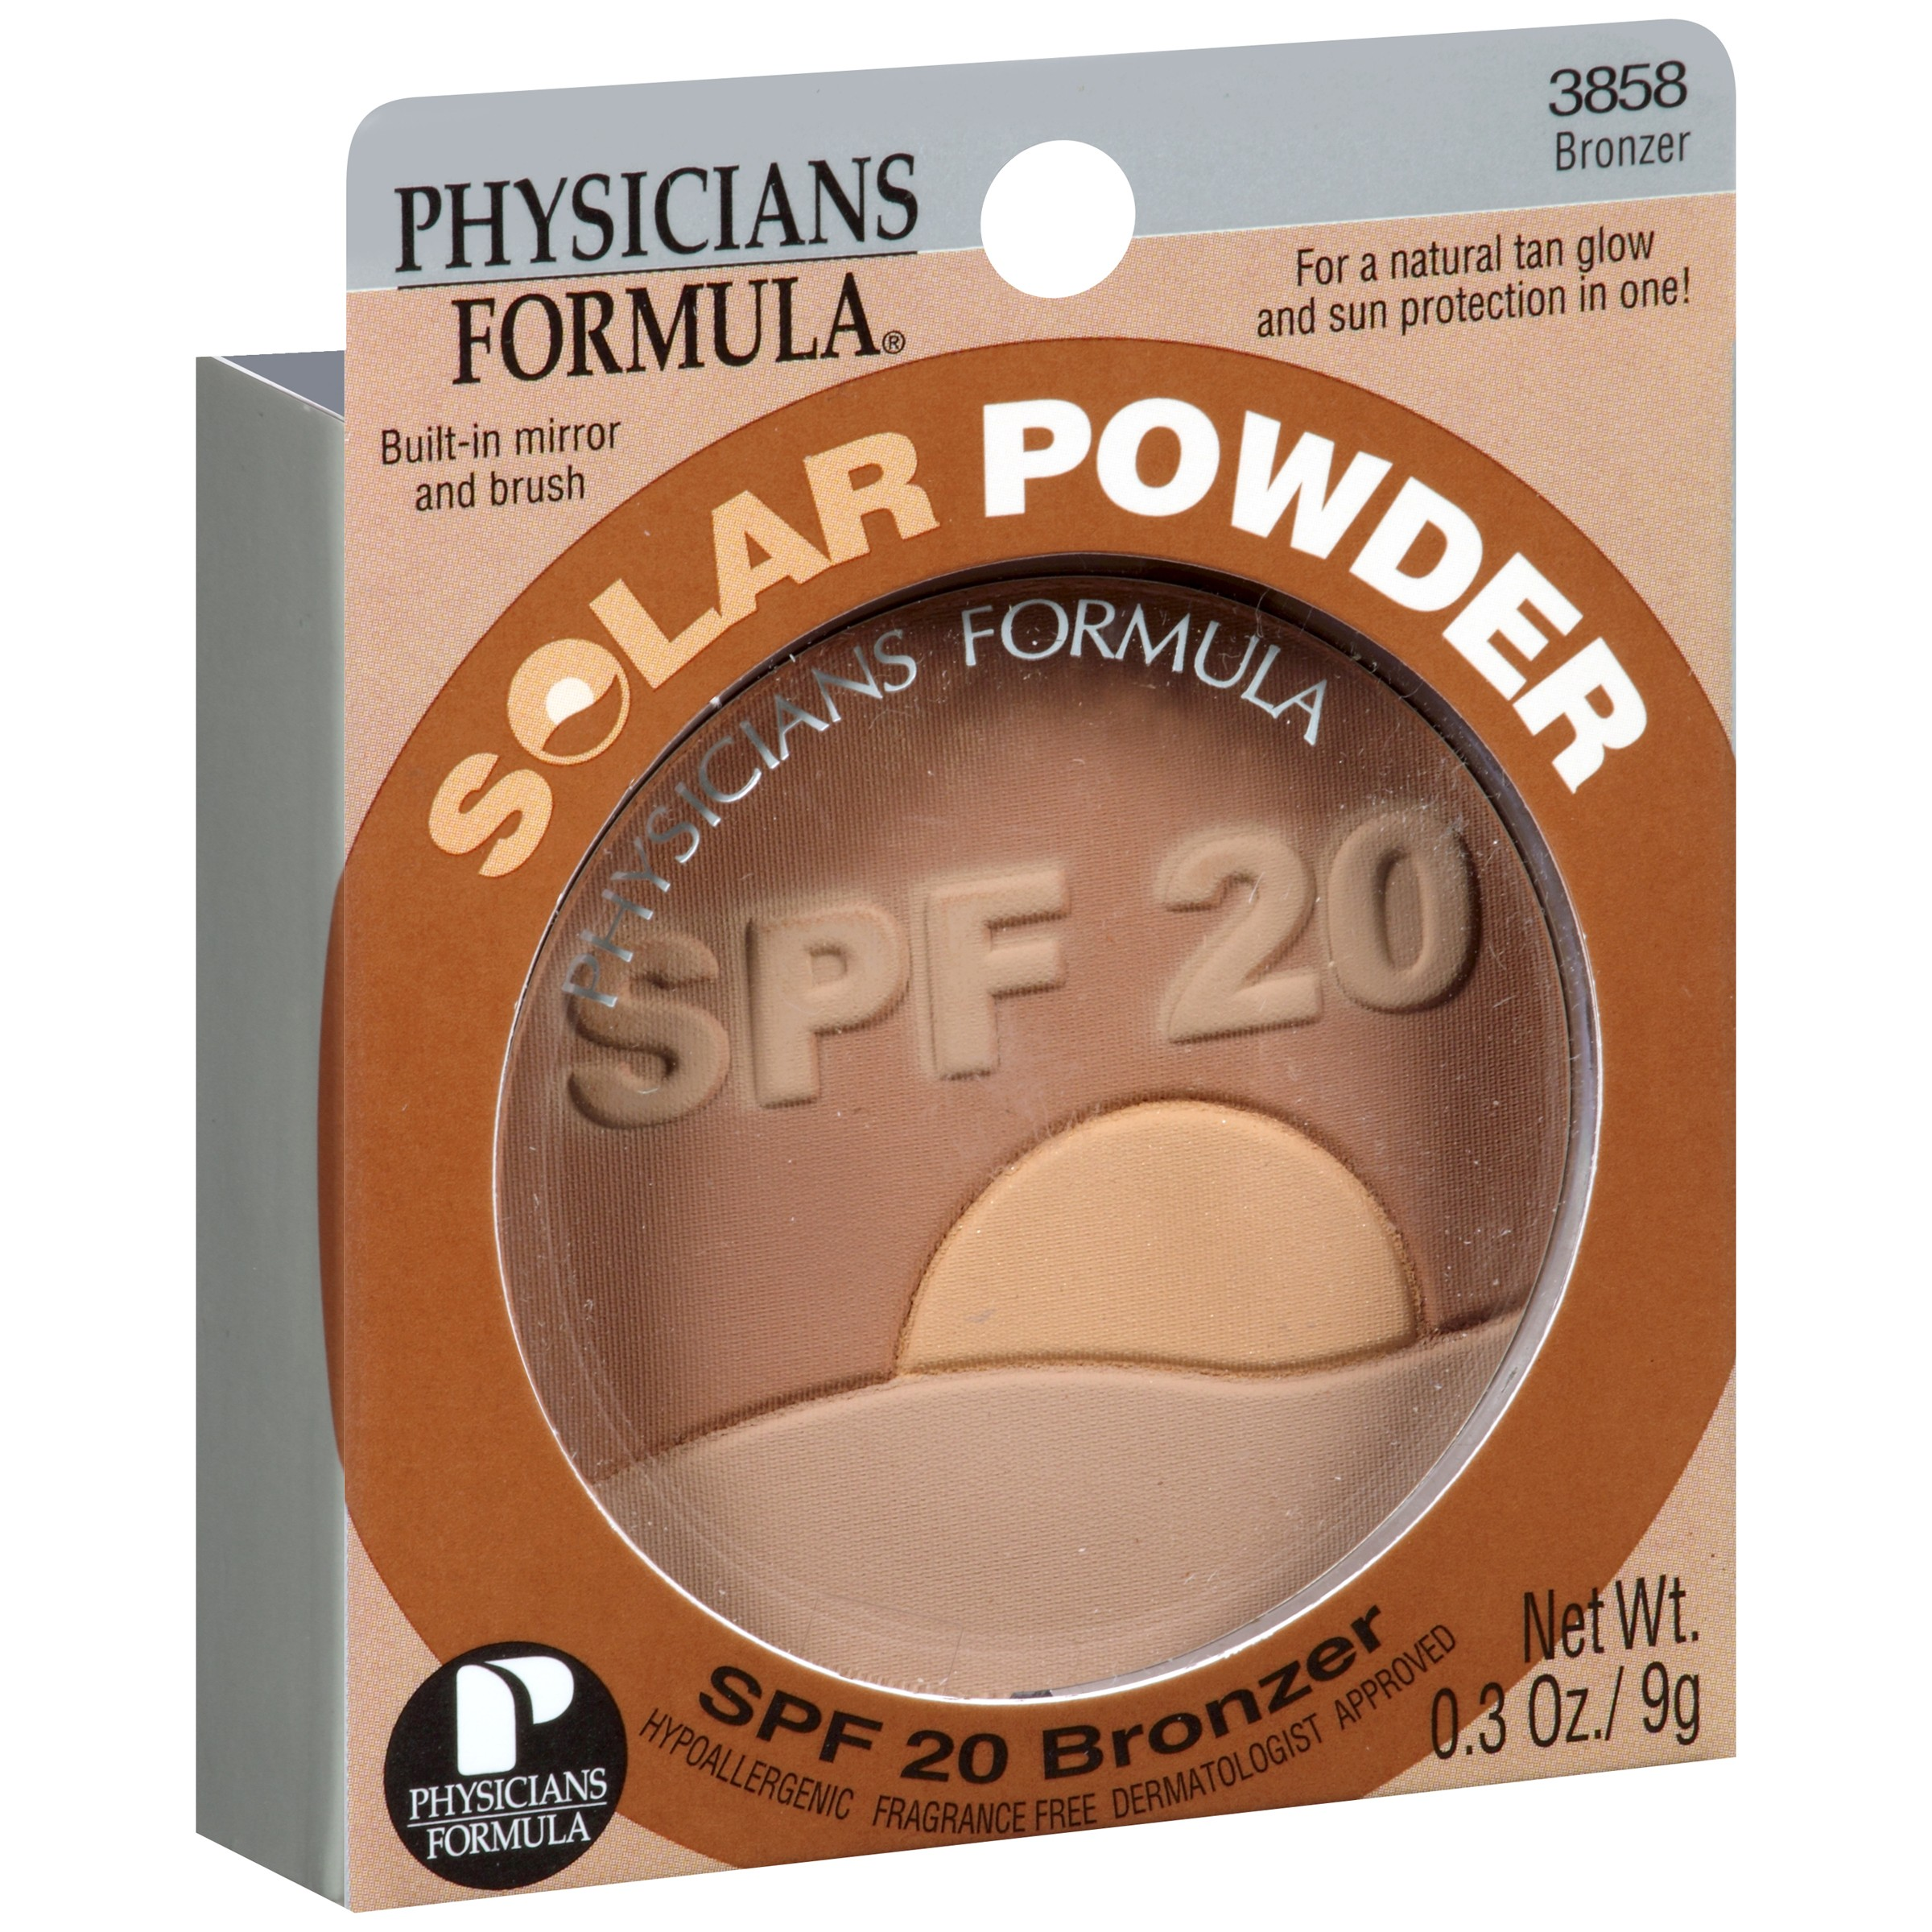 Physicians Formula Solar Powder Bronzer SPF 20 0.3 oz